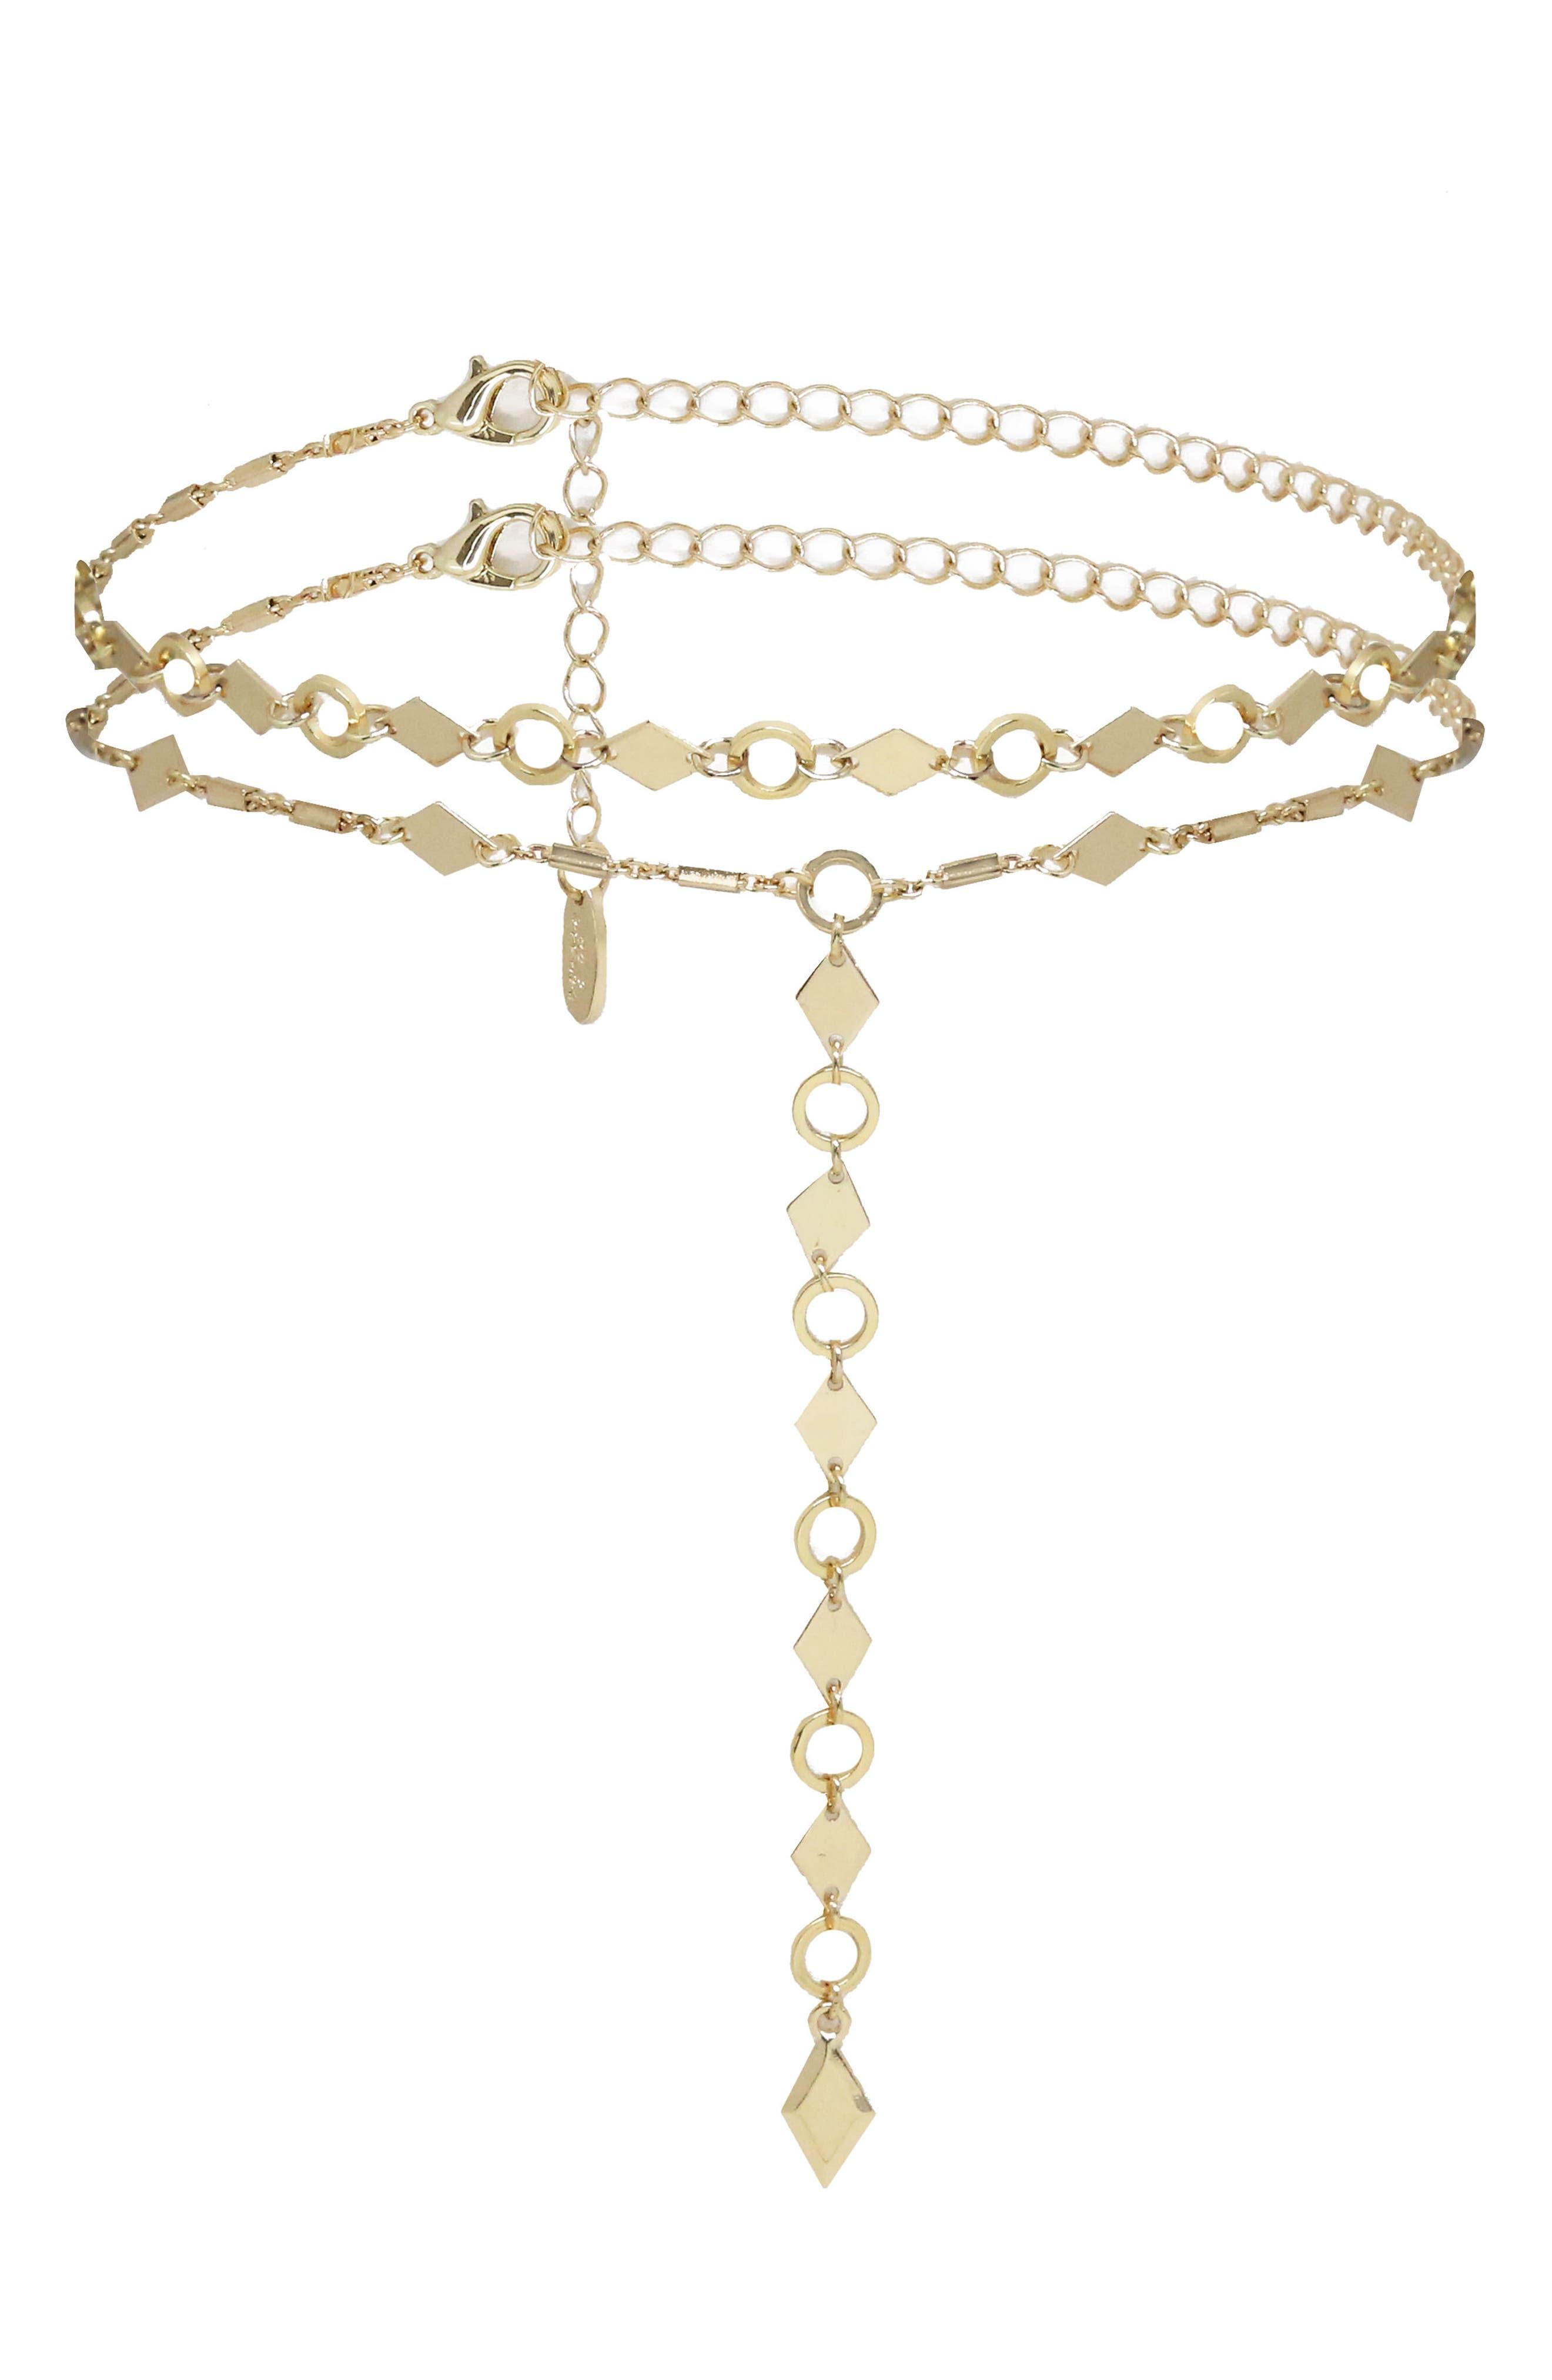 Set of 2 Geo Choker Lariat Necklaces,                             Main thumbnail 1, color,                             710